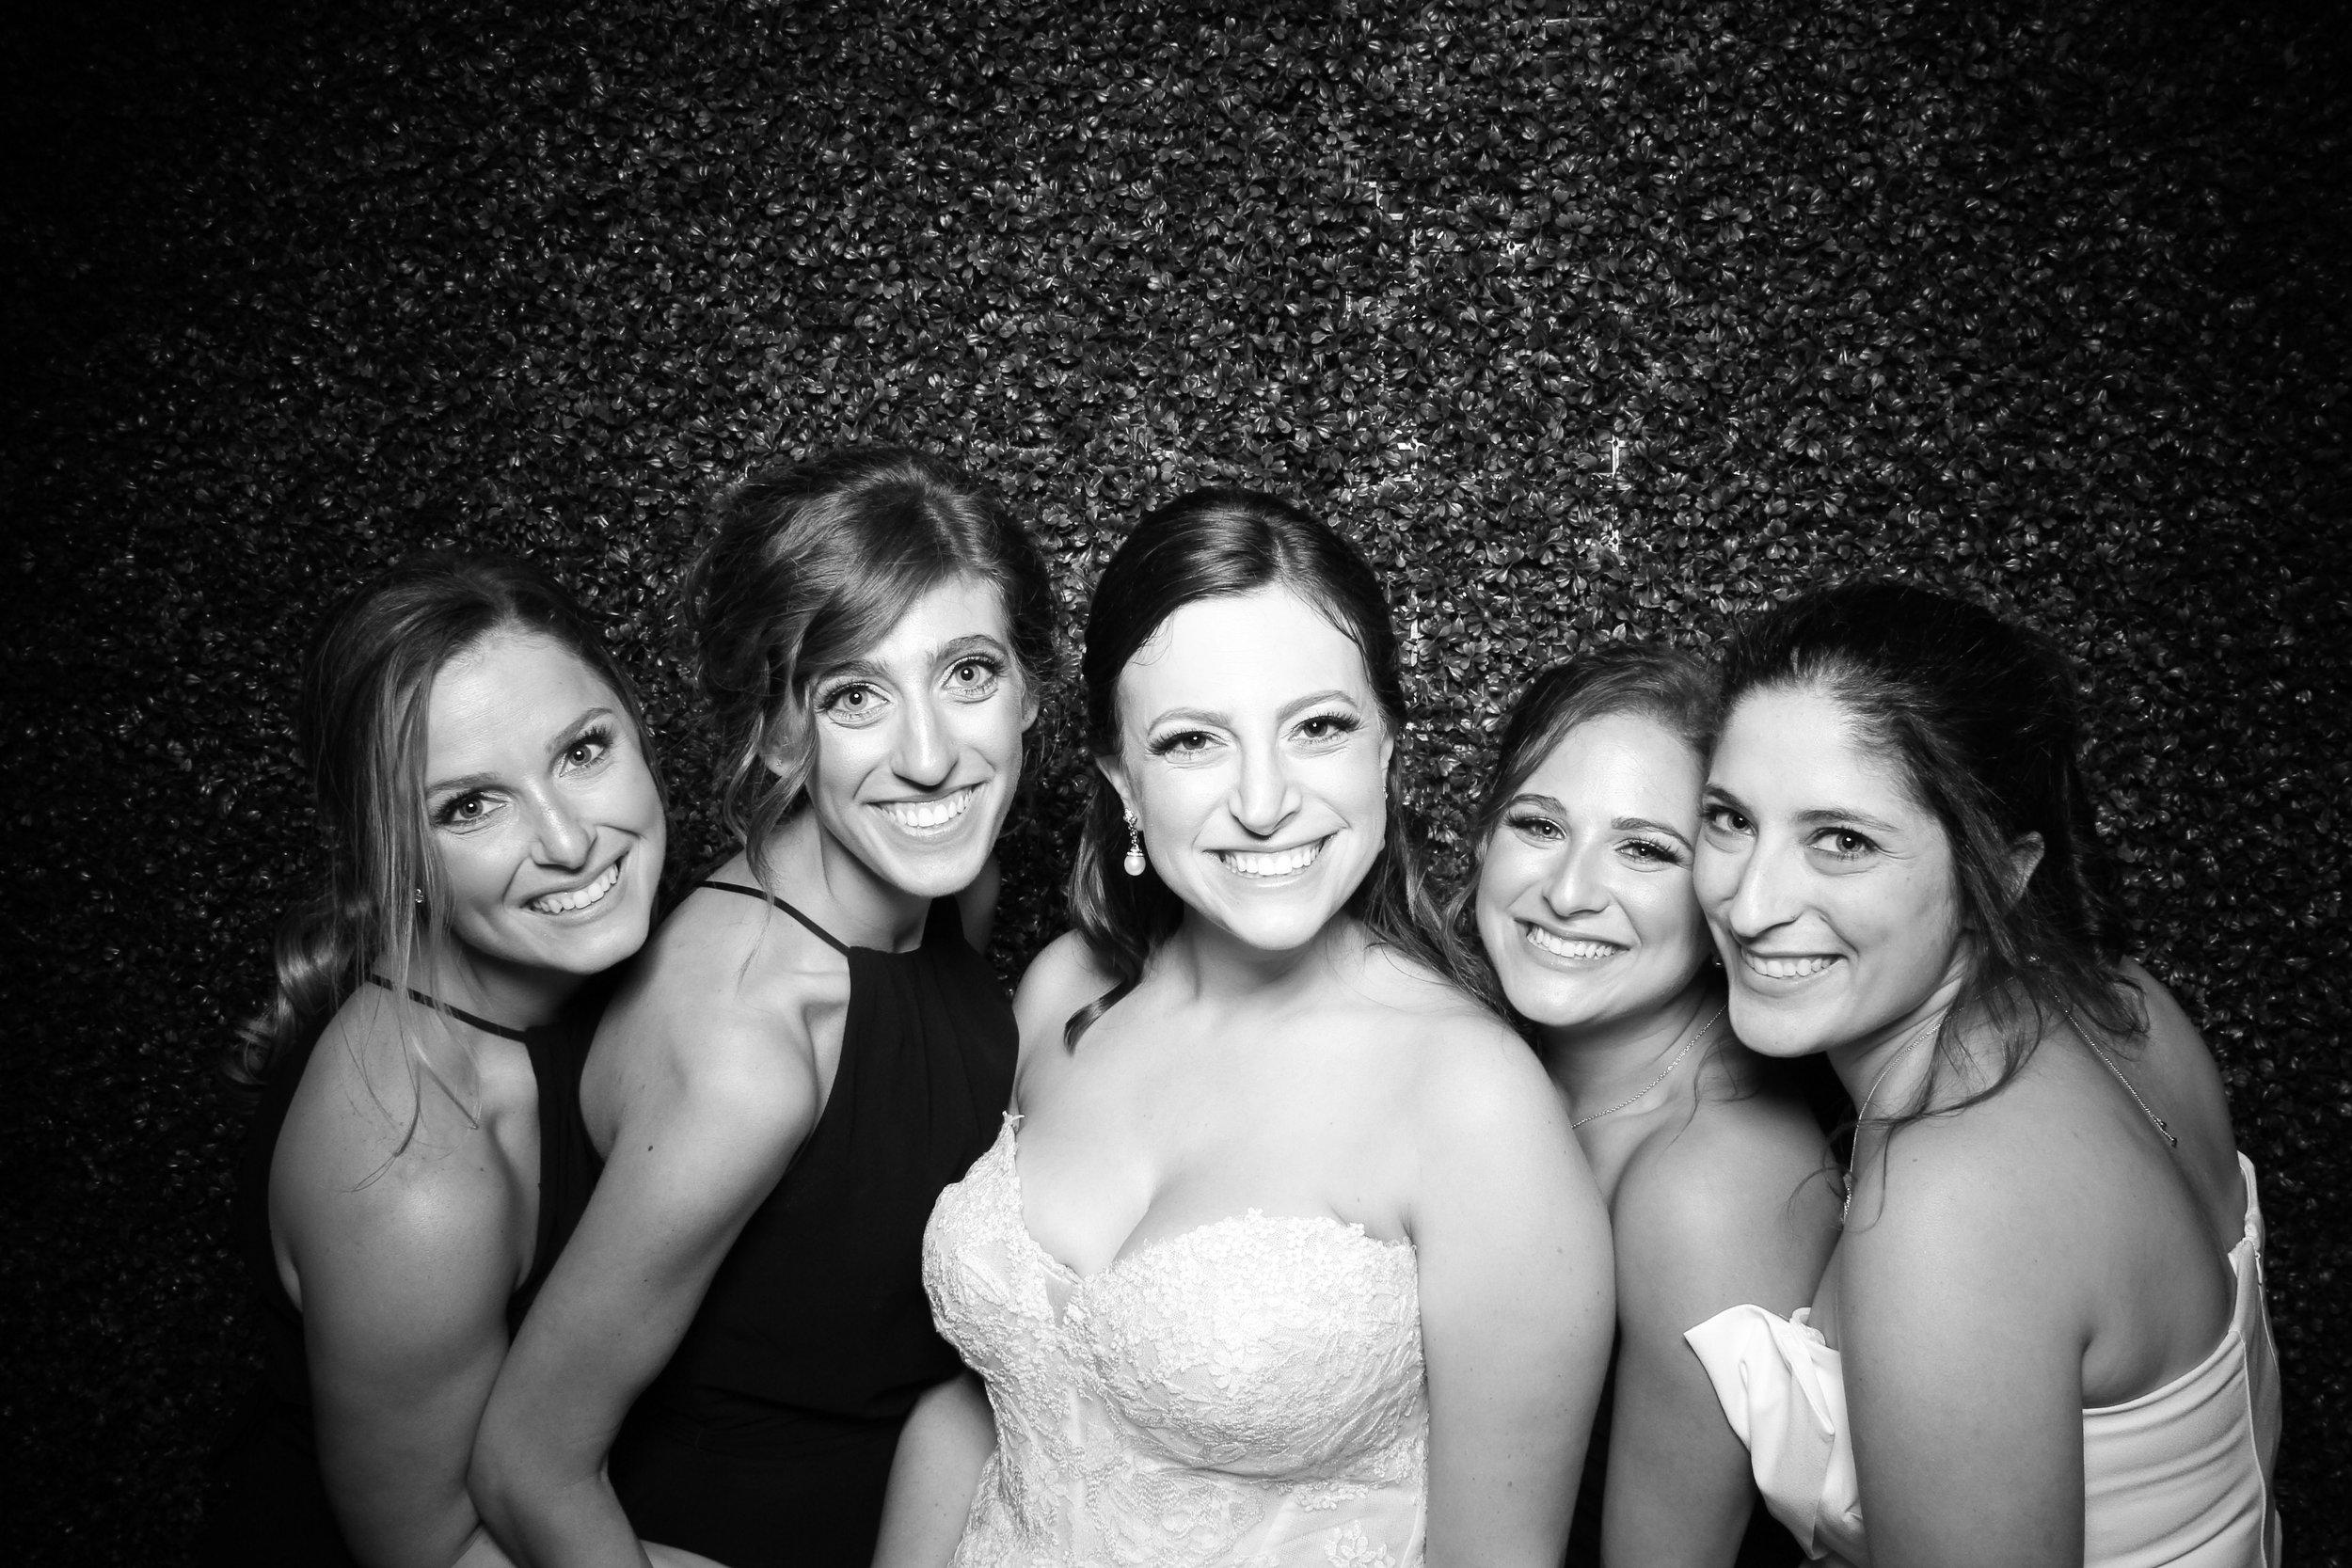 Ivy_Room_Chicago_Wedding_Reception_Photo_Booth_Rental__17.jpg